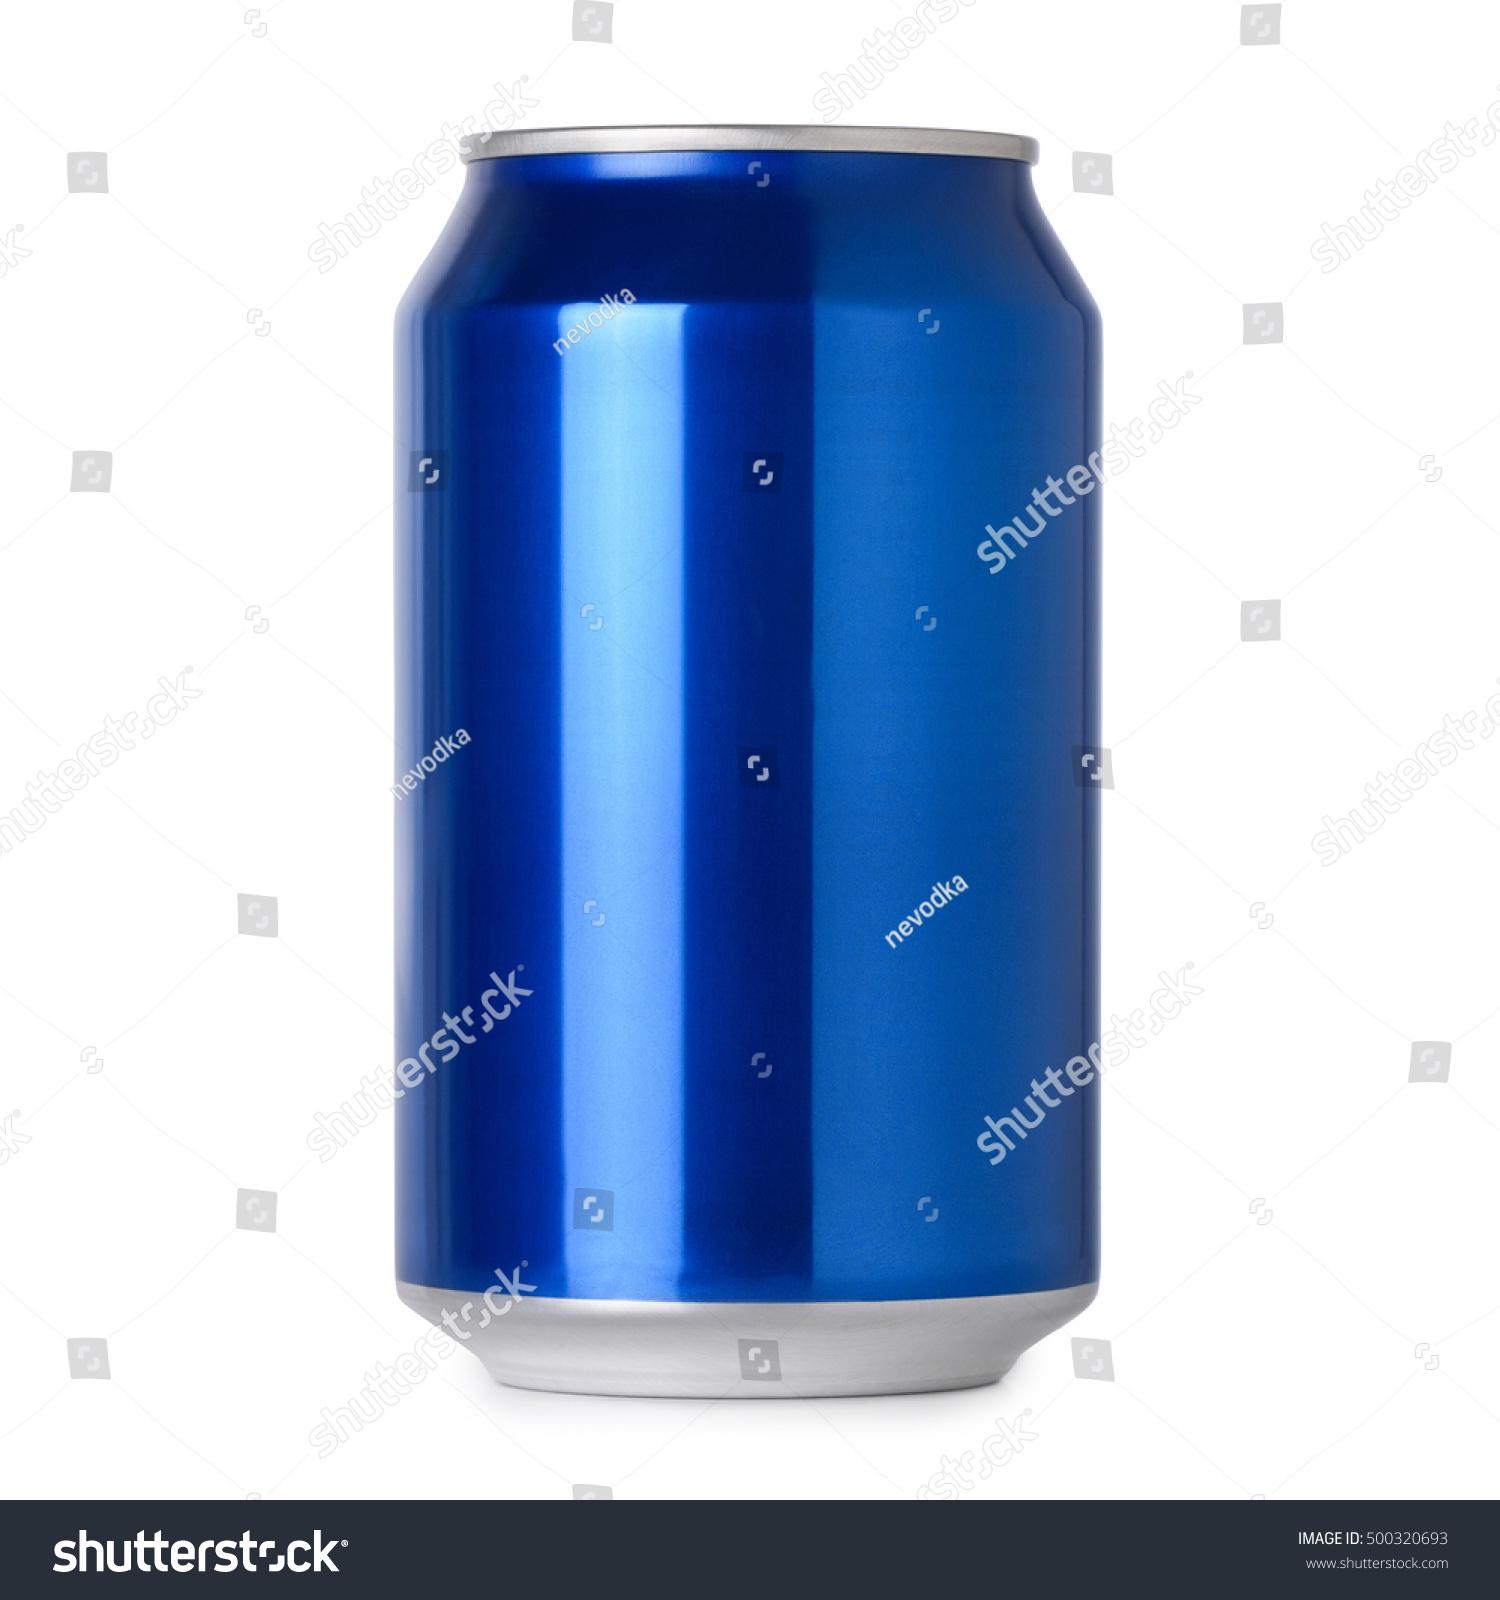 blank blue soda can - photo #5